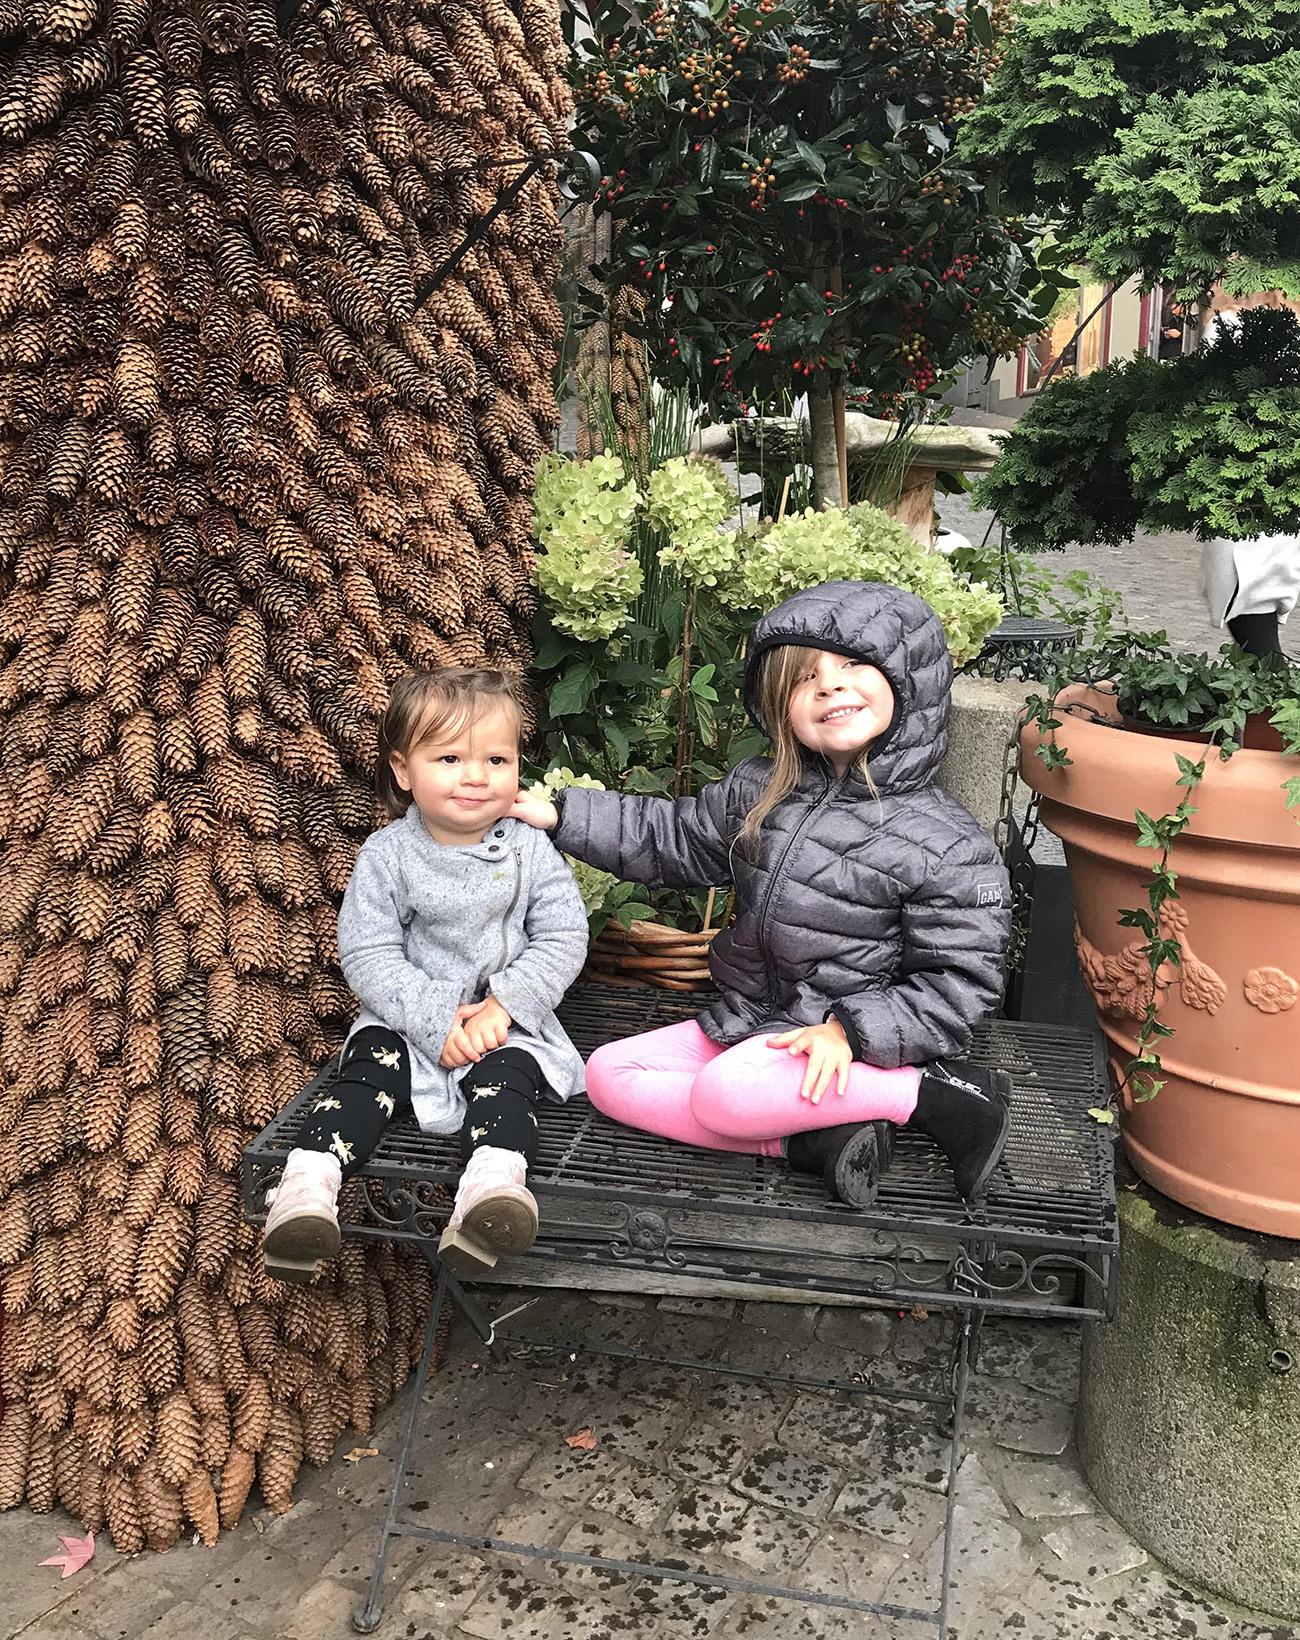 Pinecone Wall in Zurich